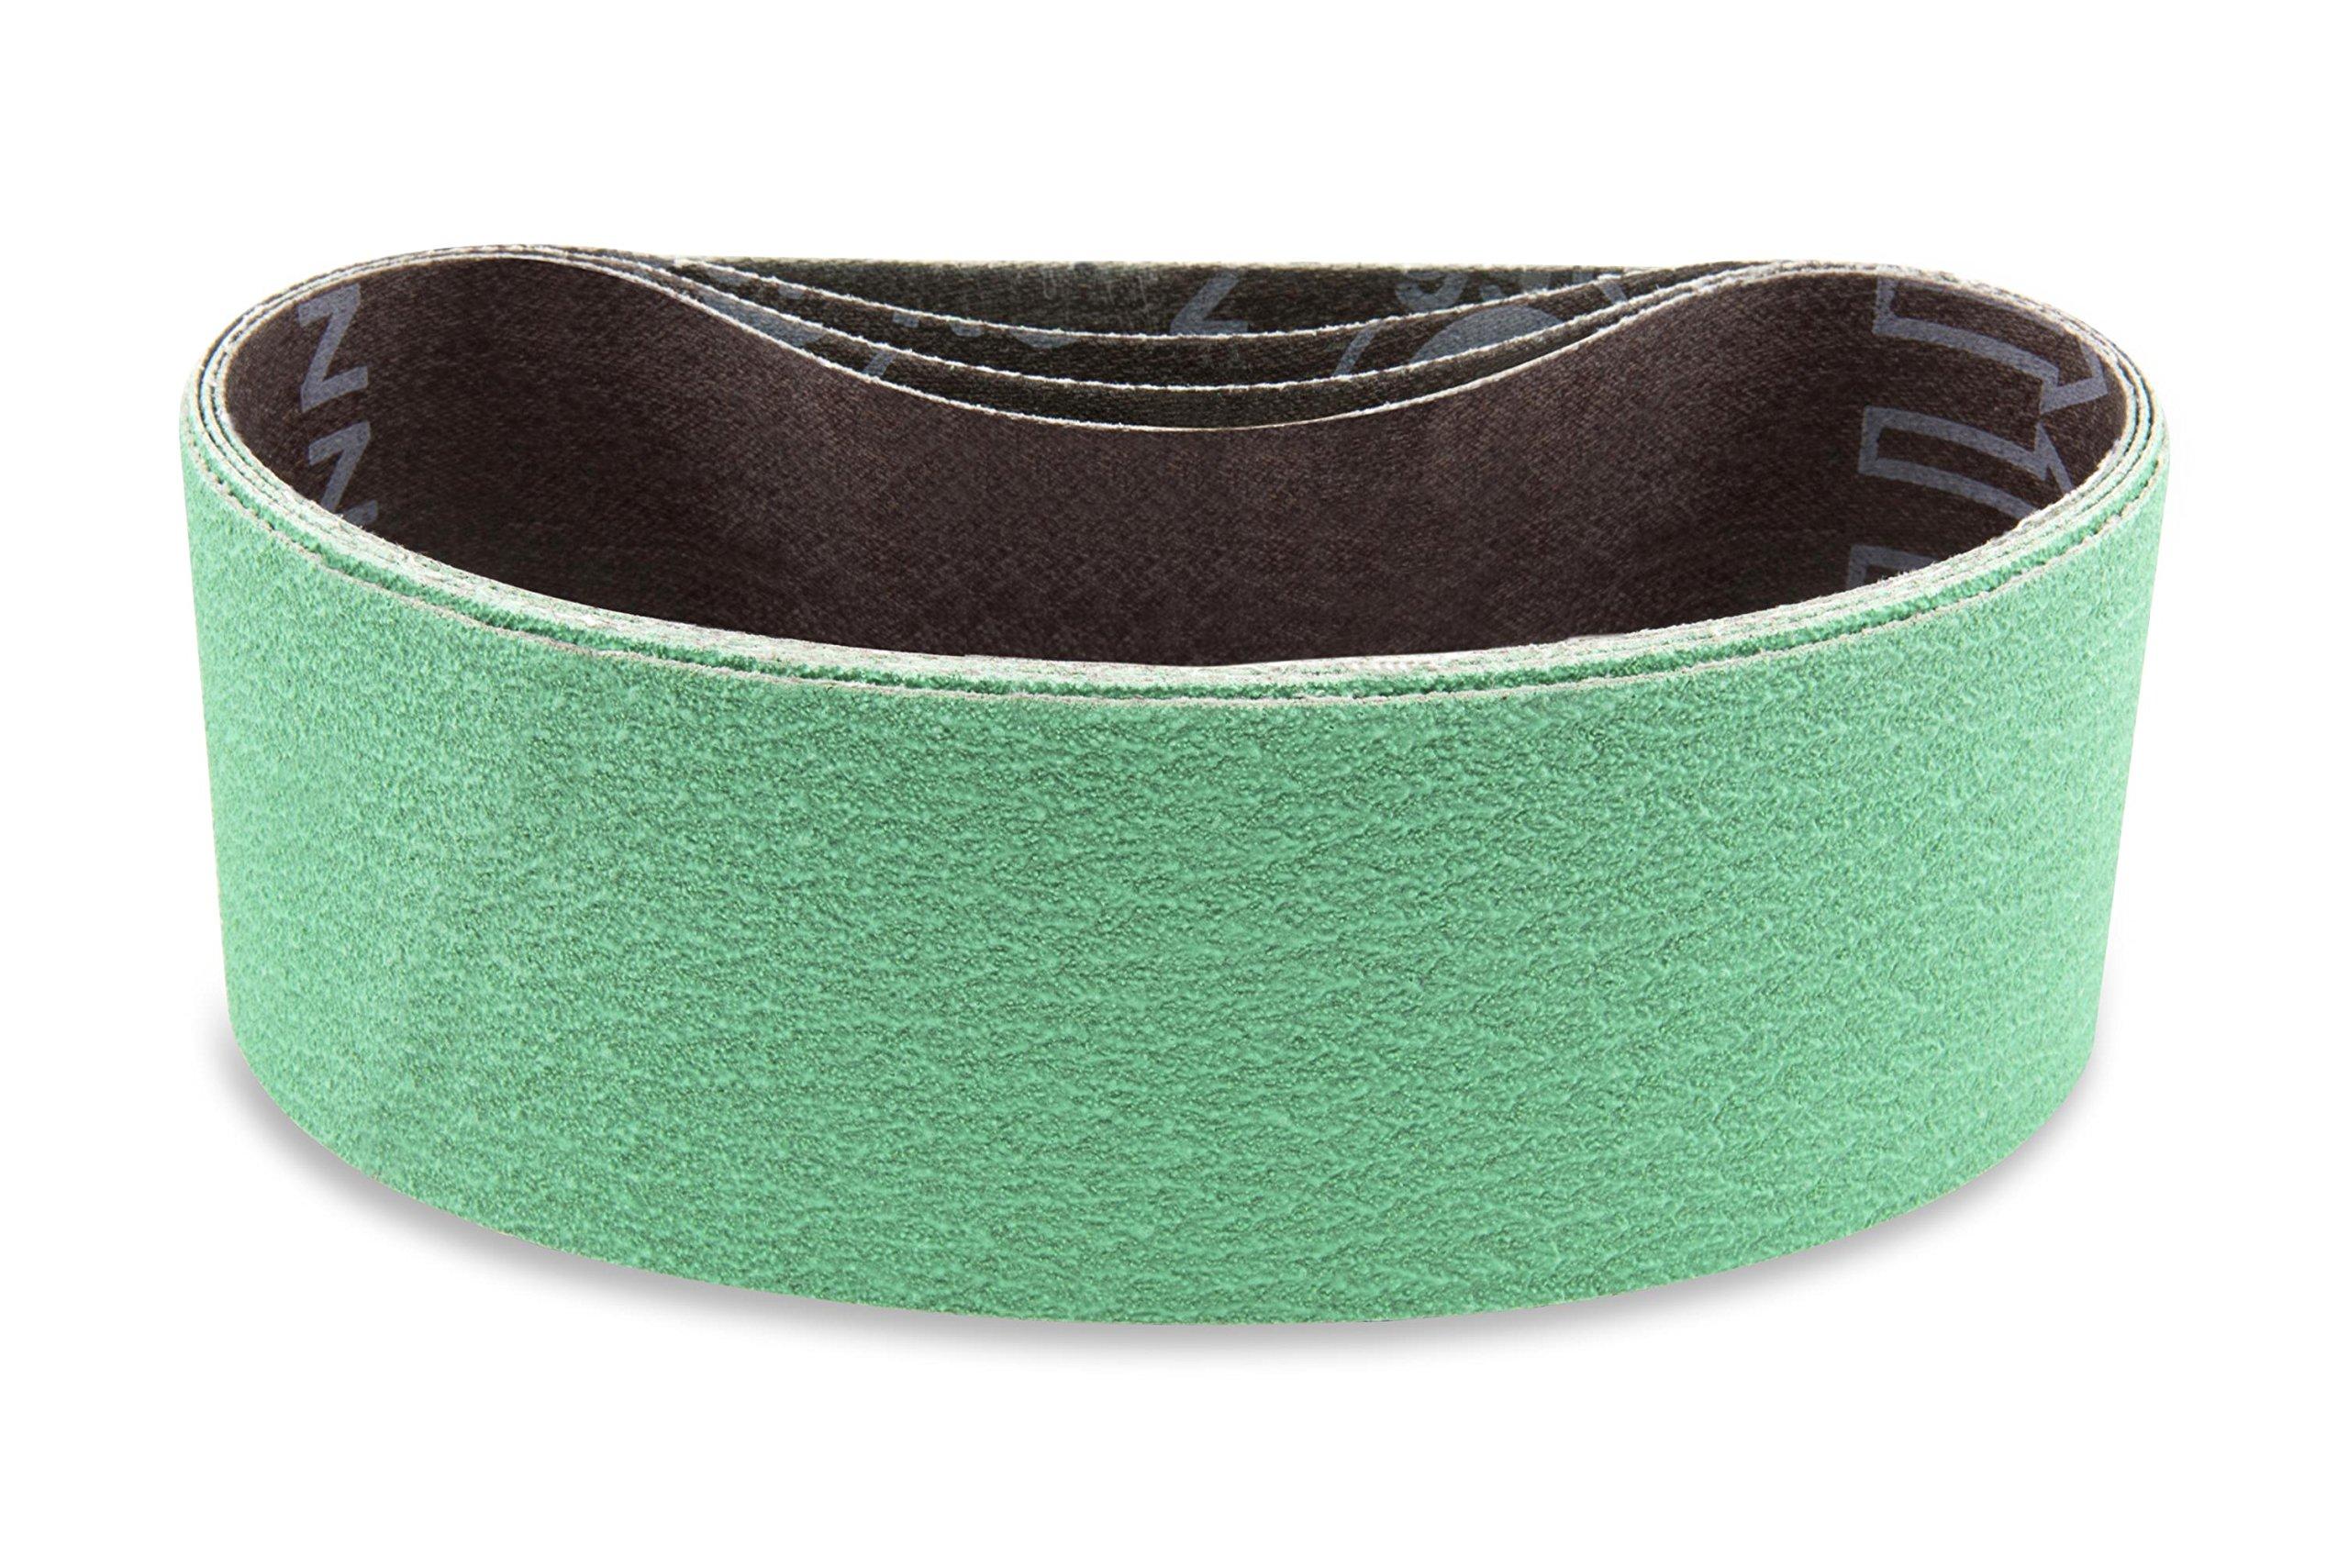 2 1/2 X 16 Inch 80 Grit Metal Grinding Ceramic Sanding Belts, Extra Long Life, 6 Pack